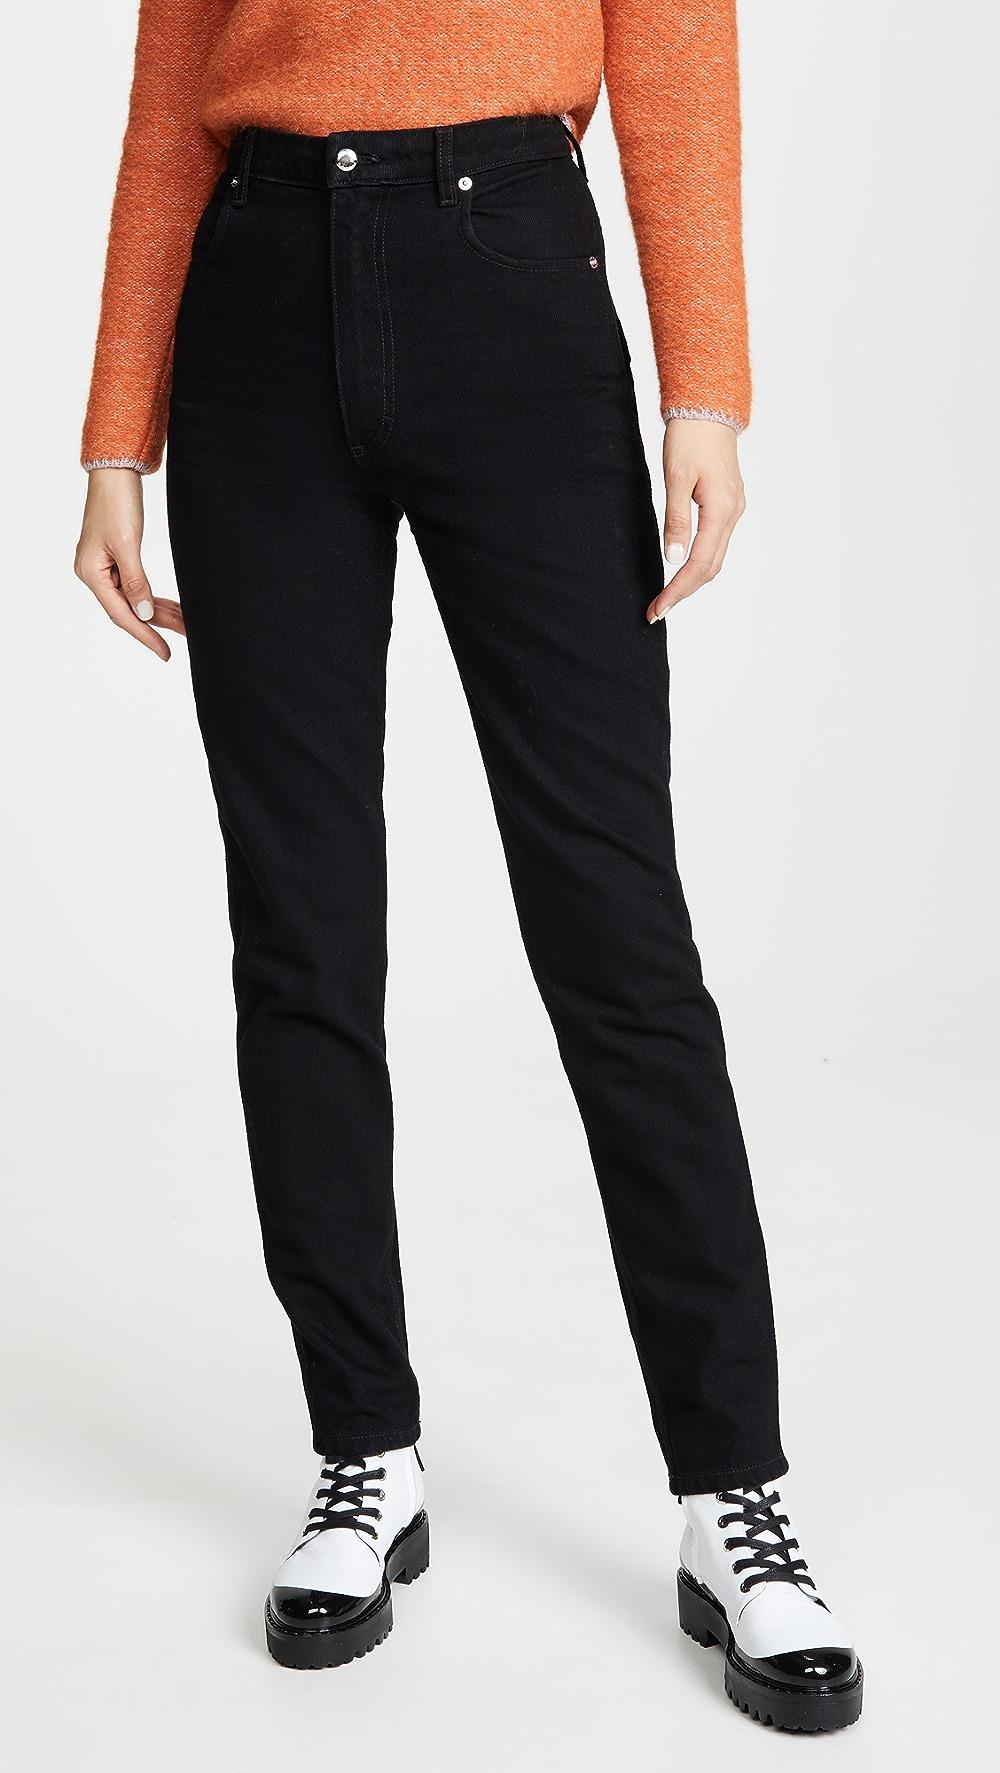 Glorious Eckhaus Latta - El Jeans Sale Overall Discount 50-70%